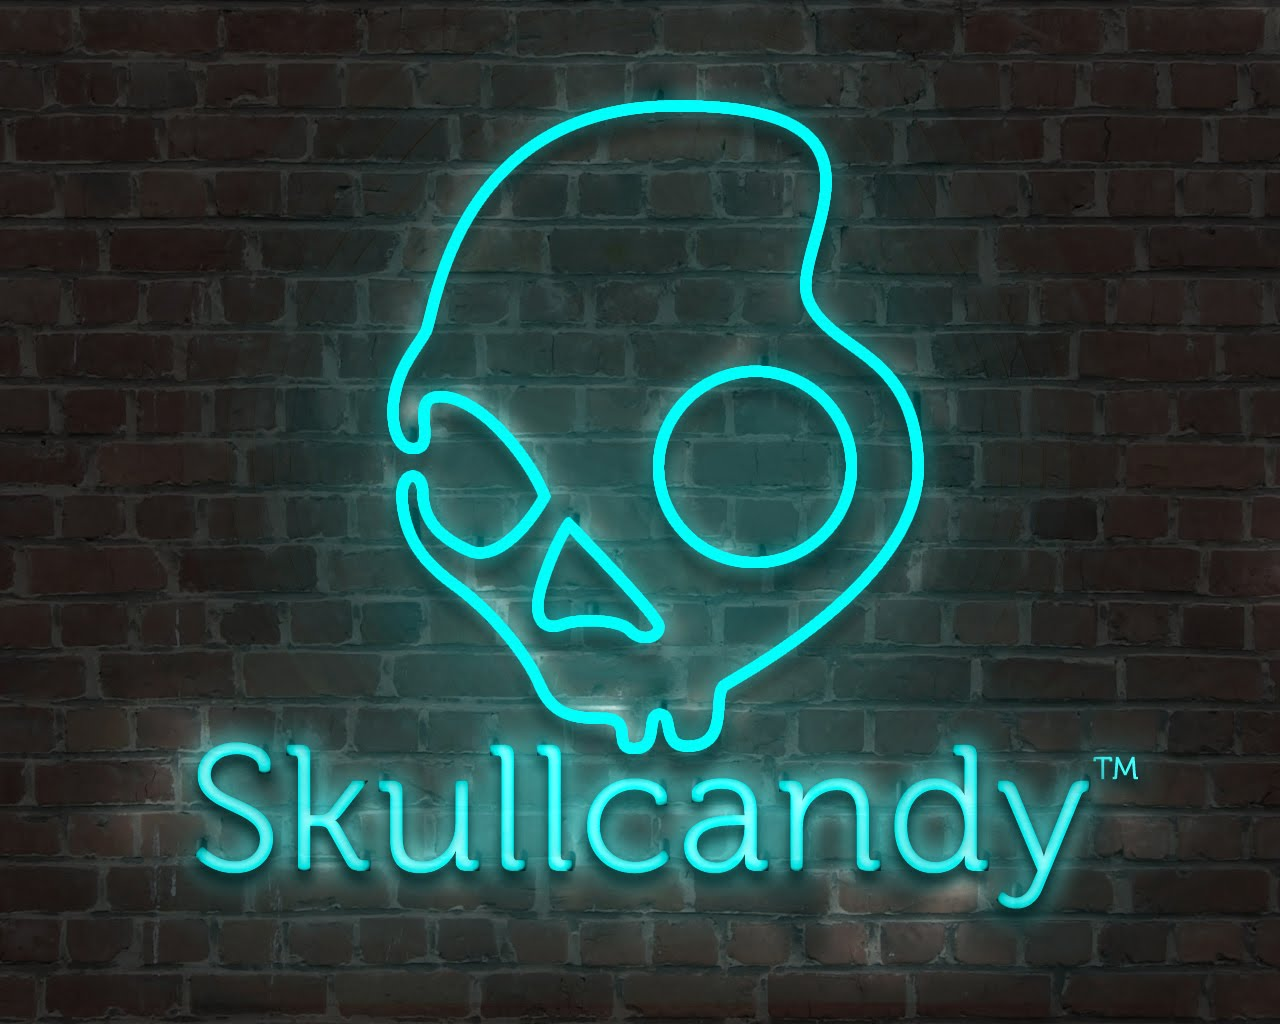 Skullcandy    Winning Contest Design   ryan noles    art director